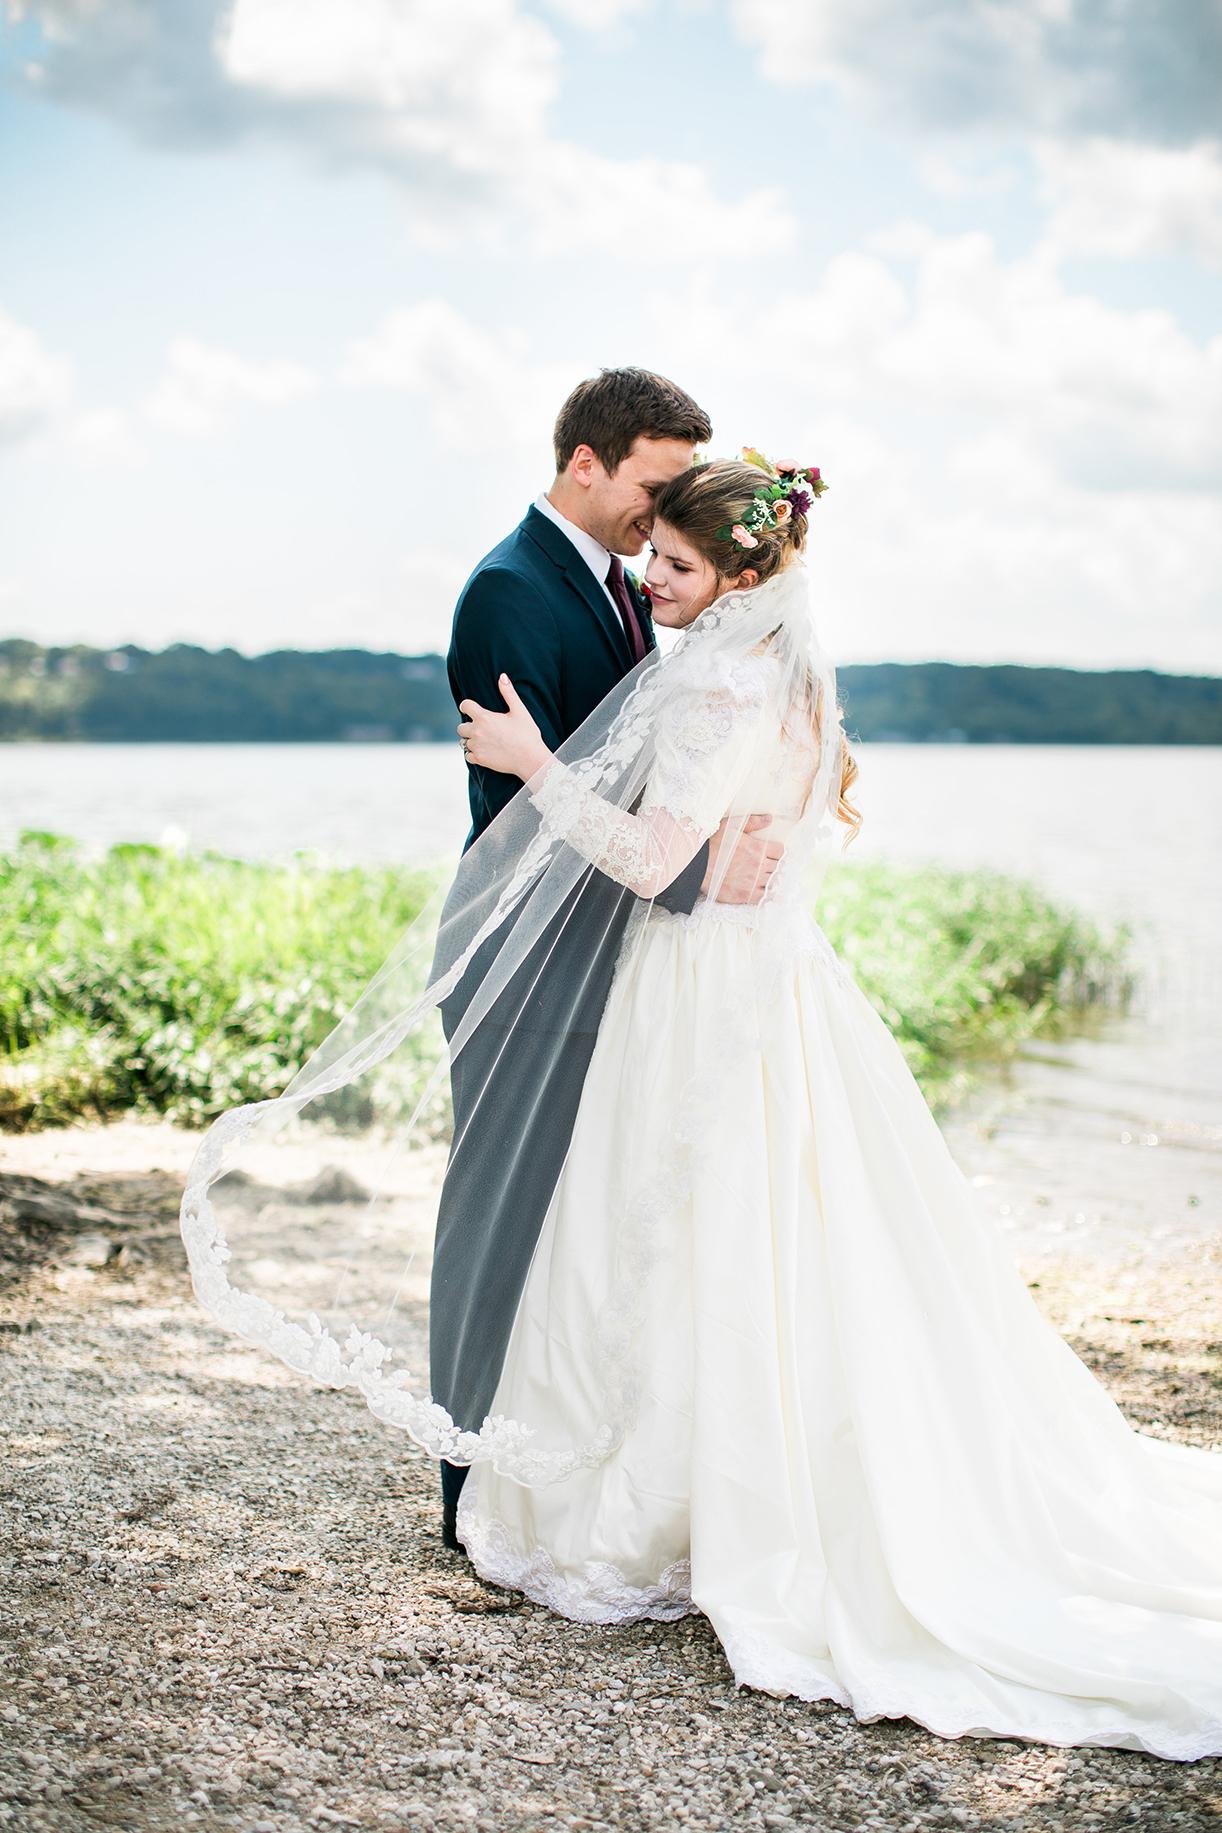 Jared Gabby Wedding August 1 2018-print-0166.jpg